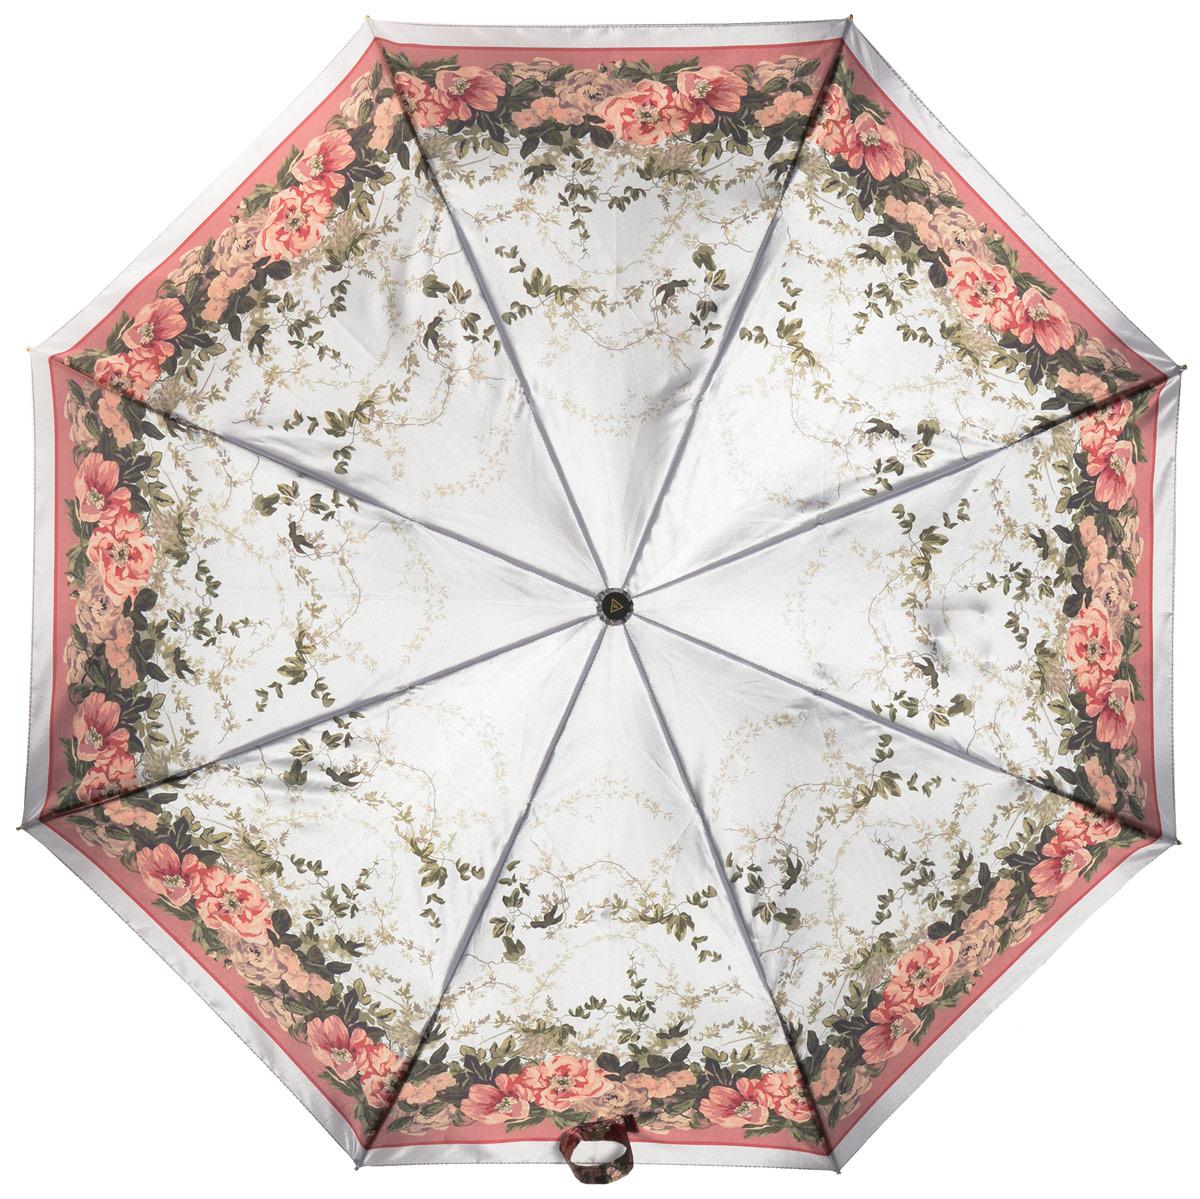 Зонт женский Fabretti, автомат, 3 сложения, цвет: мультиколор. L-16107-24L-16107-24Зонт женский Fabretti, облегченный суперавтомат, 3 сложения